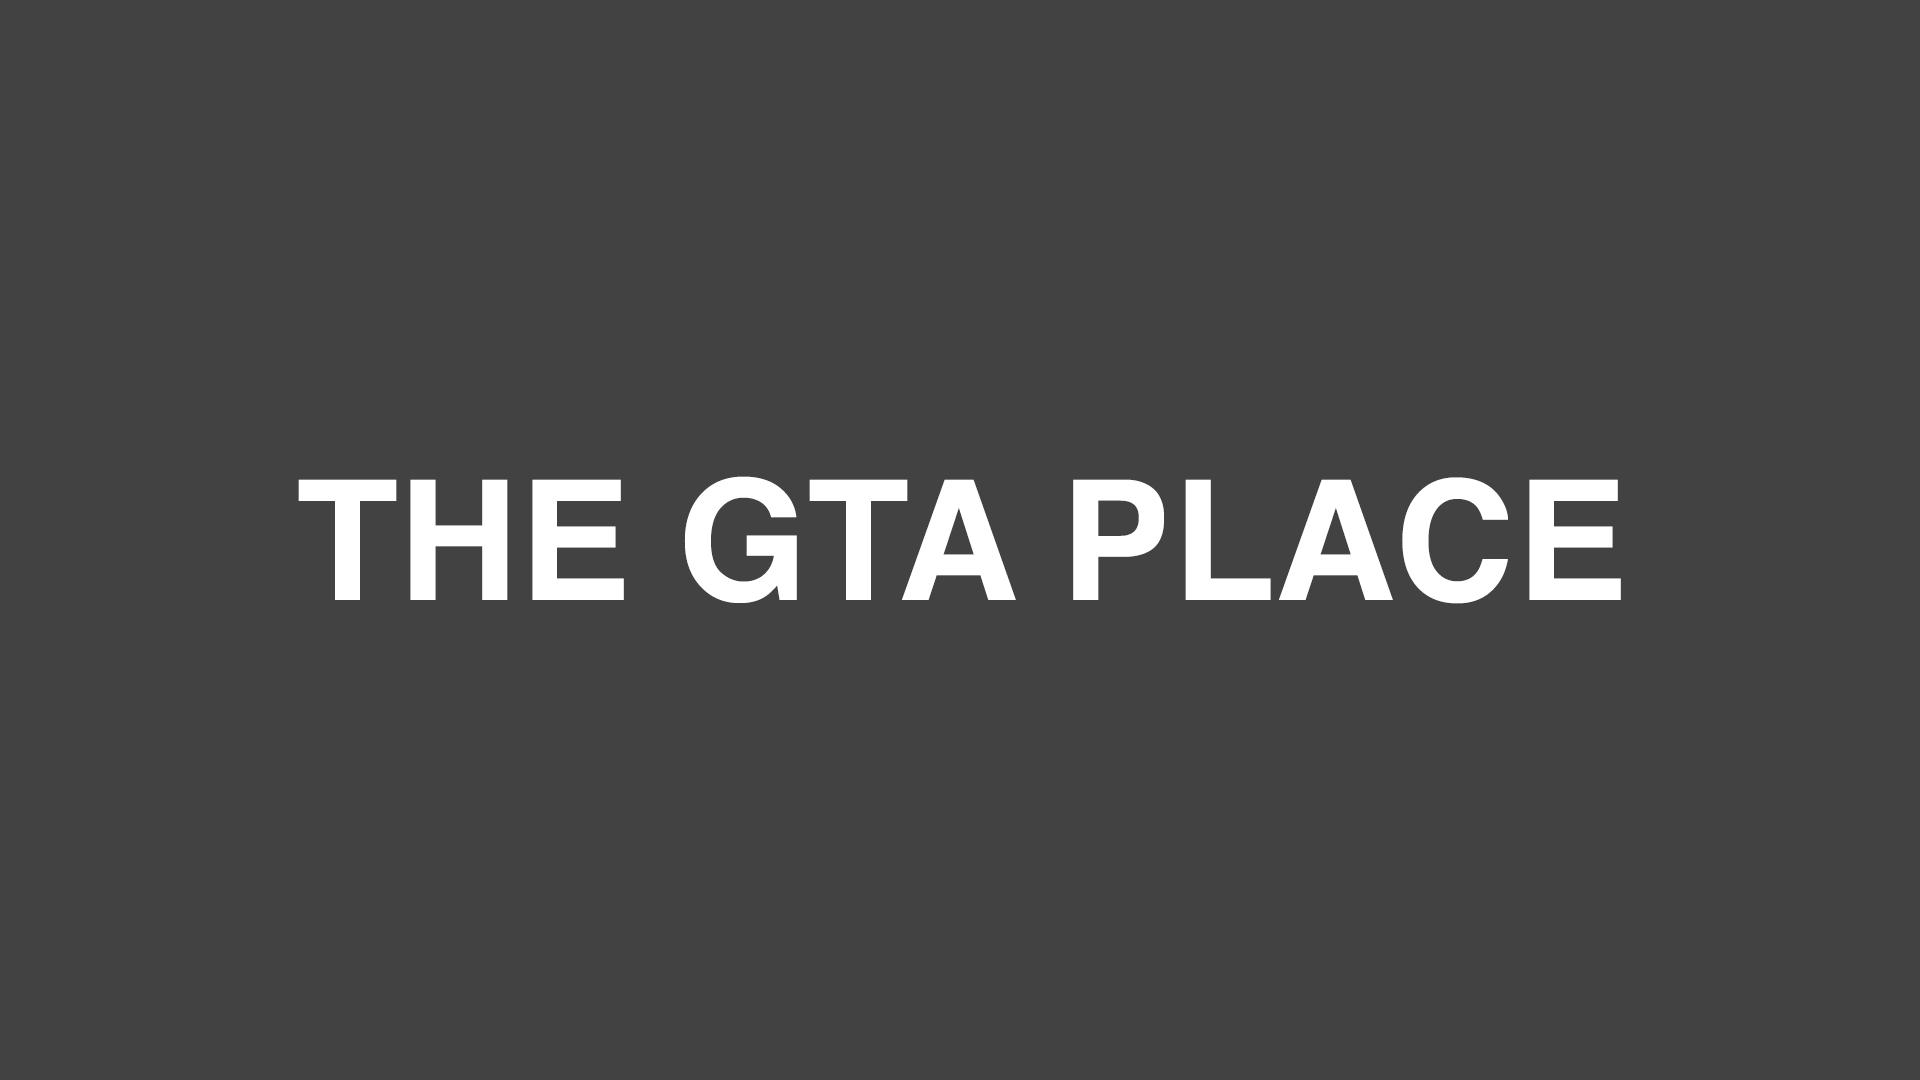 The-GTA-Place-logo